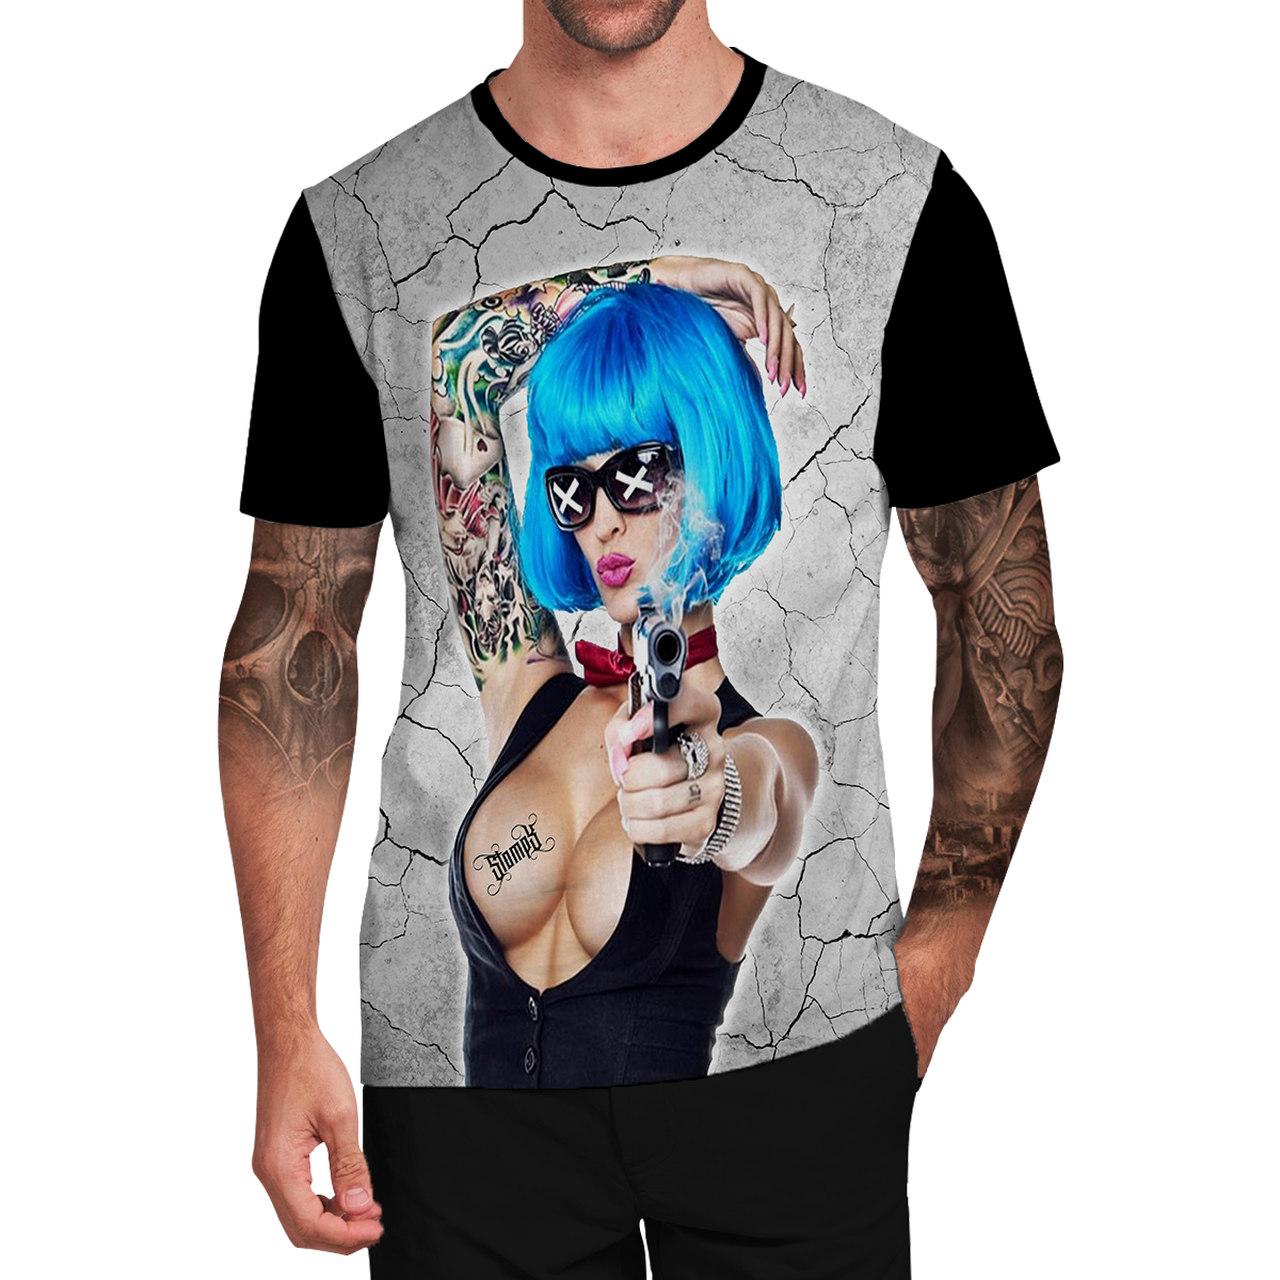 Stompy Camiseta Tattoo Tatuagem Caveira Skull 59